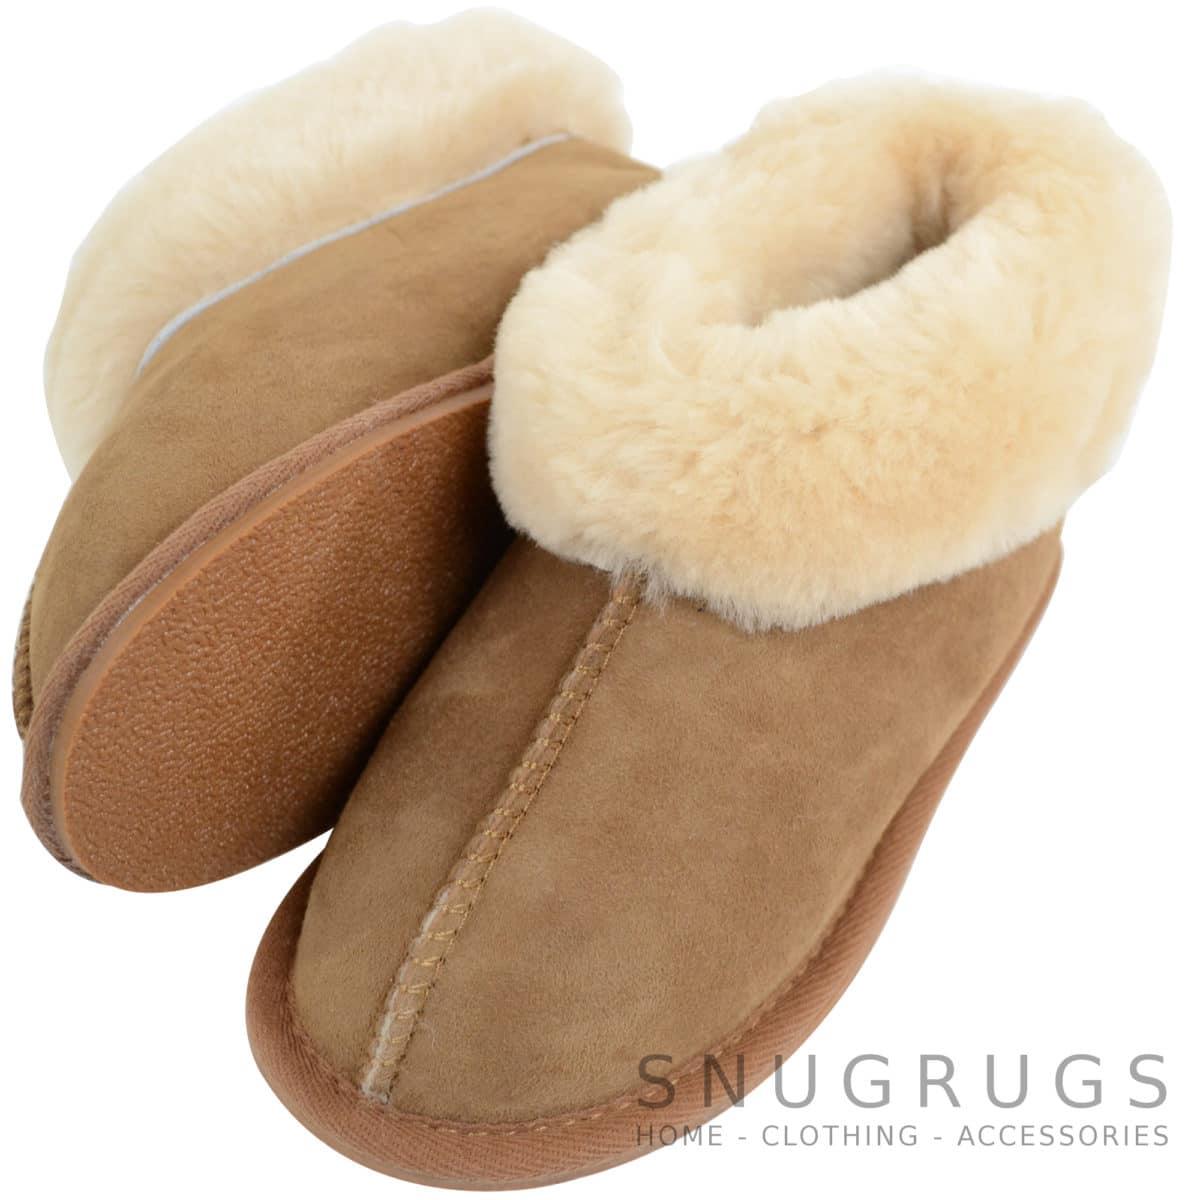 Kids Sheepskin Slippers with Wool Cuff - Chestnut - Snugrugs